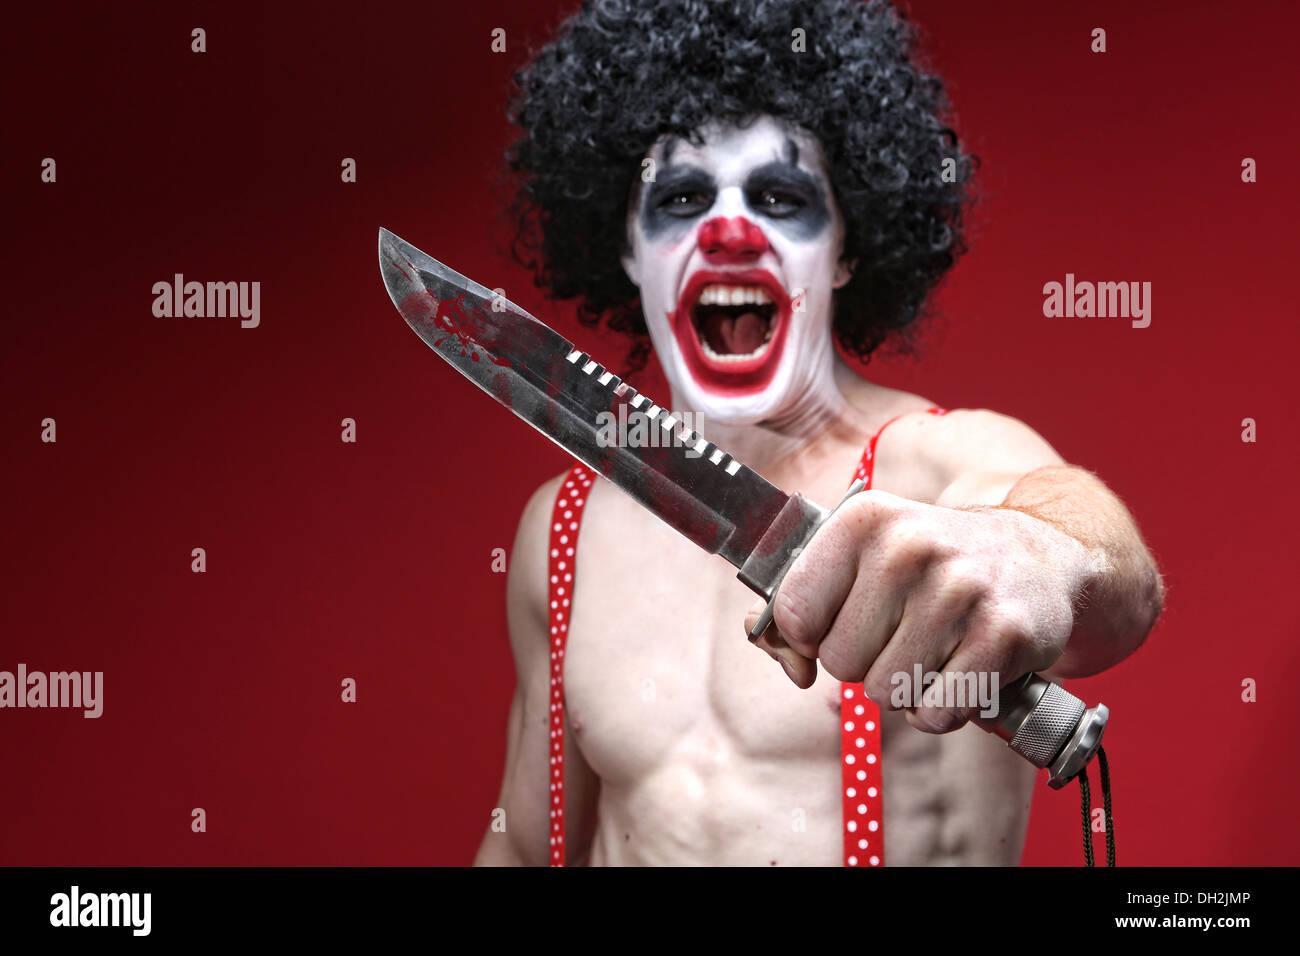 Mal Spooky Payaso sujeta la cuchilla vertical Imagen De Stock